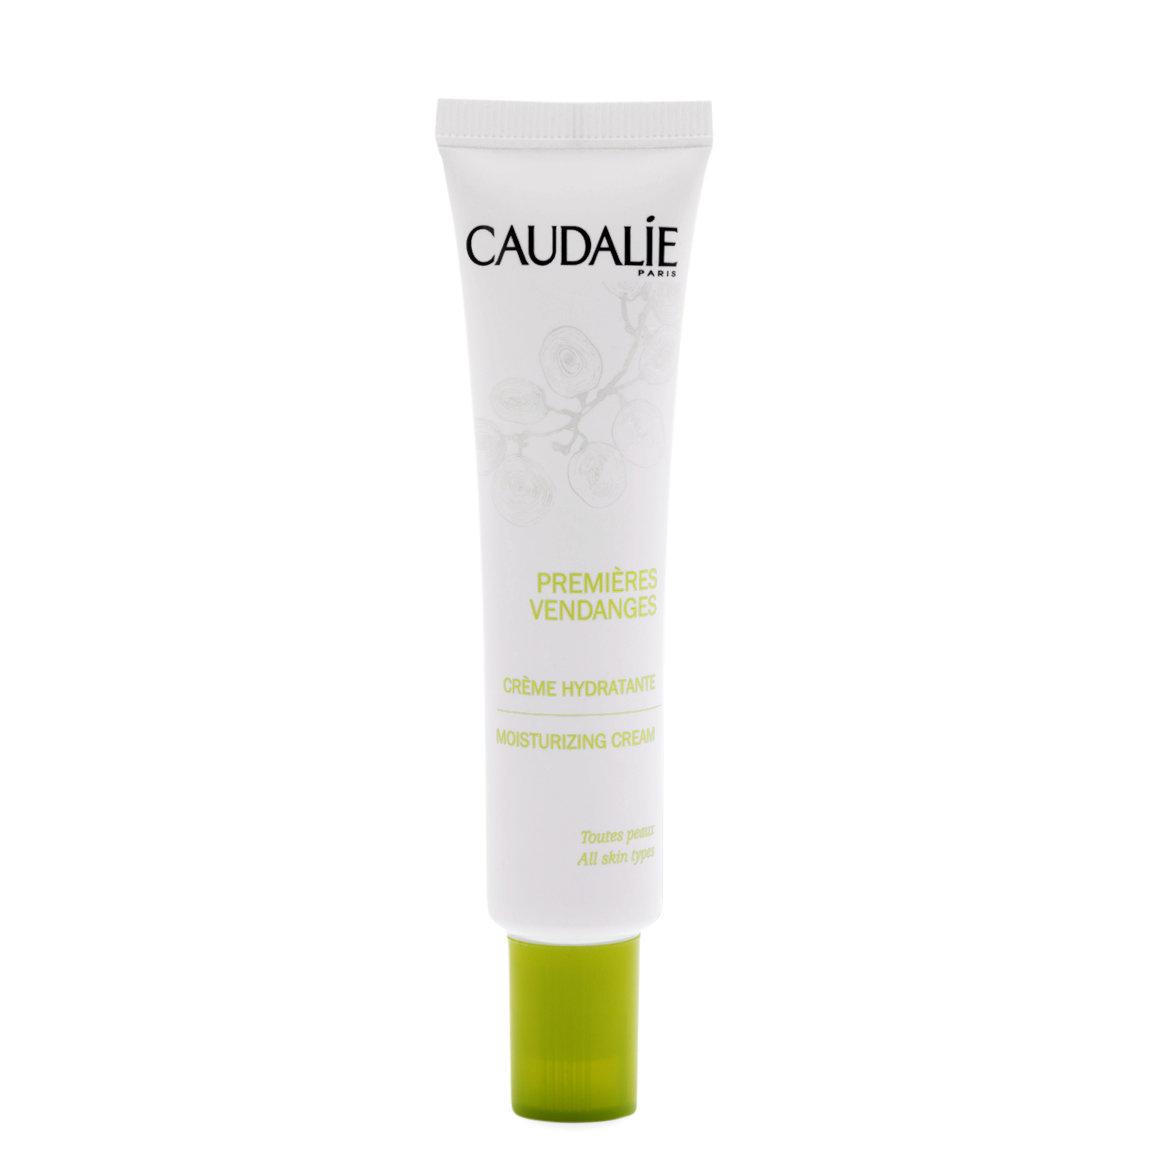 Caudalie Premieres Vendanges Moisturizing Cream alternative view 1 - product swatch.